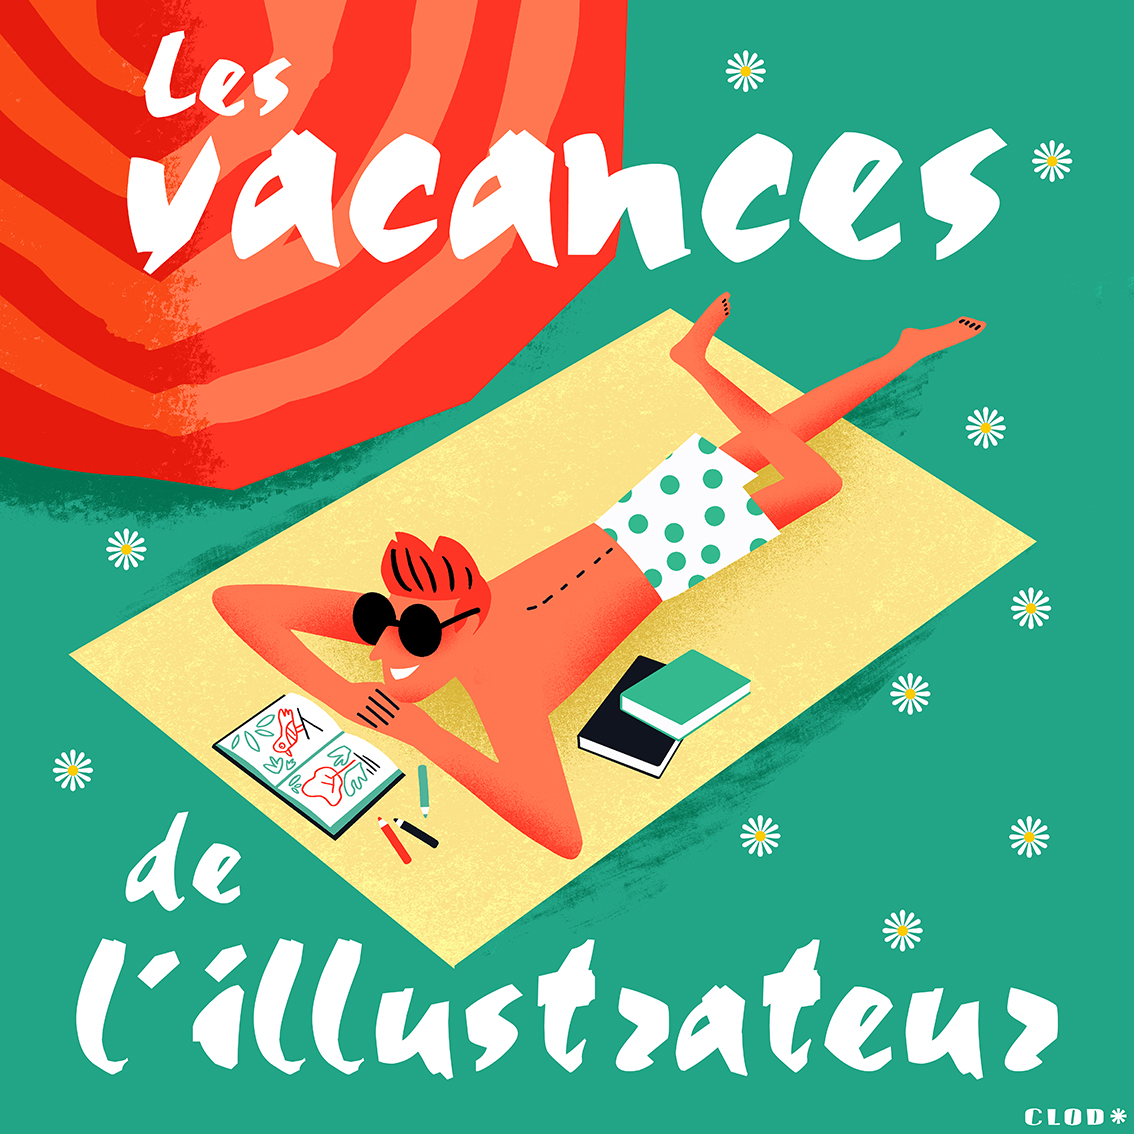 Clod blog, les vacances de l'illustrateur